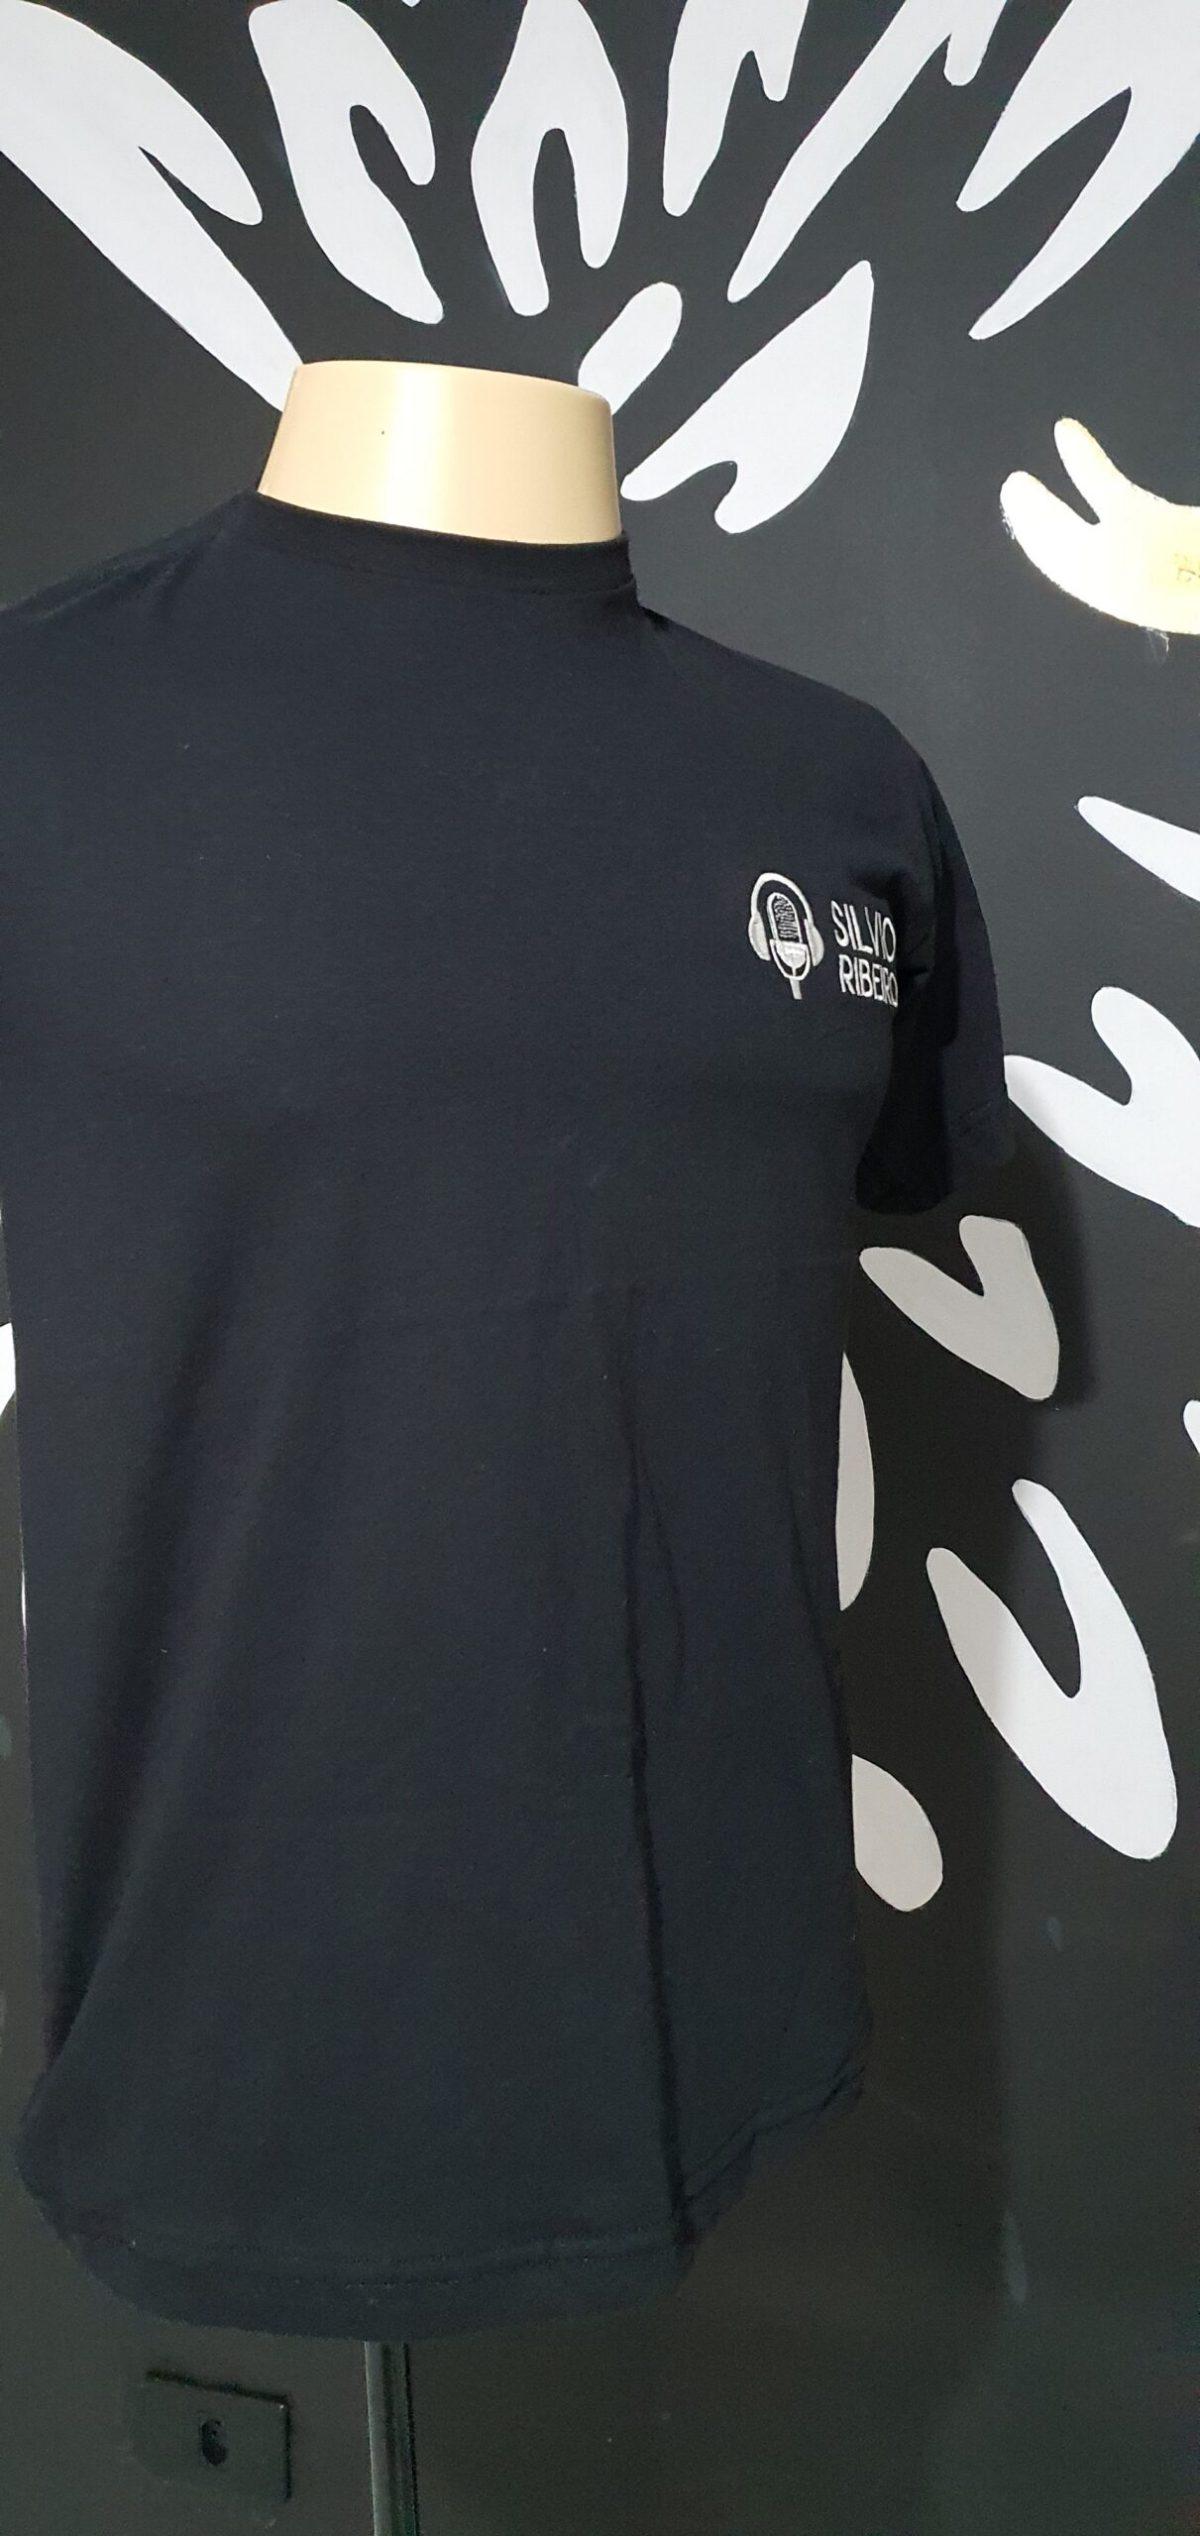 Camiseta Bordada Oficial do Silvio Ribeiro Locutor - Logo - by Bordado & Cia - @bordado.cia @silvioribeirolocutor